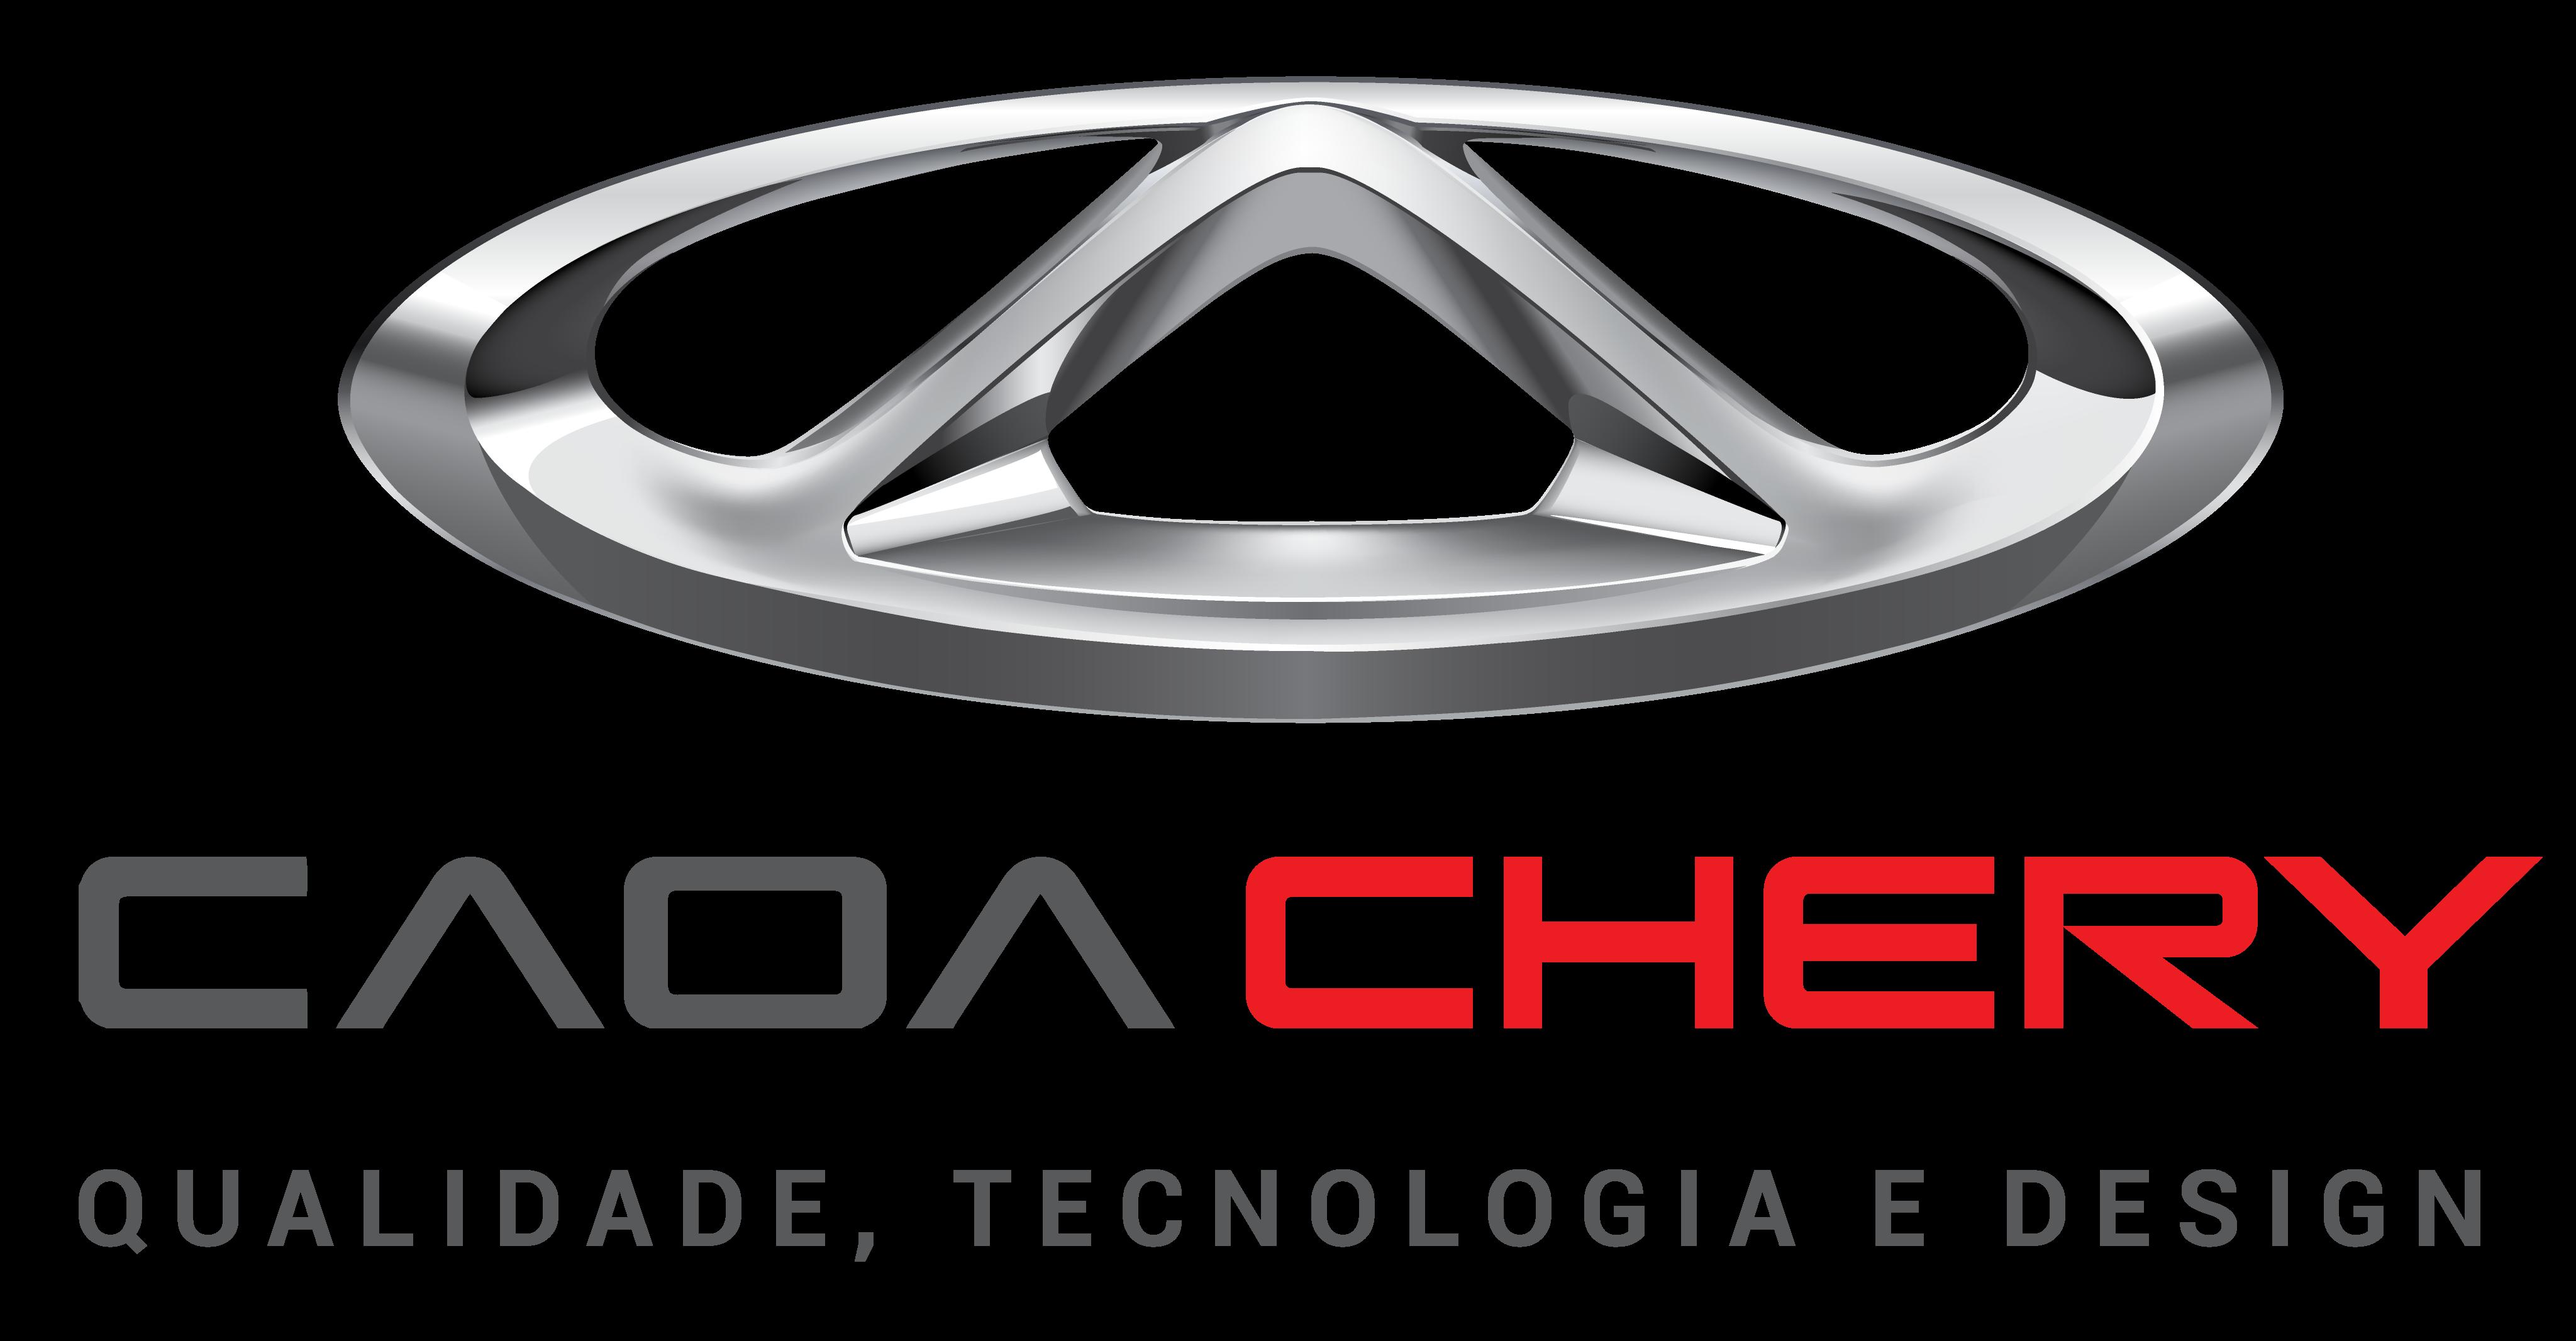 CAOA Chery Logo.